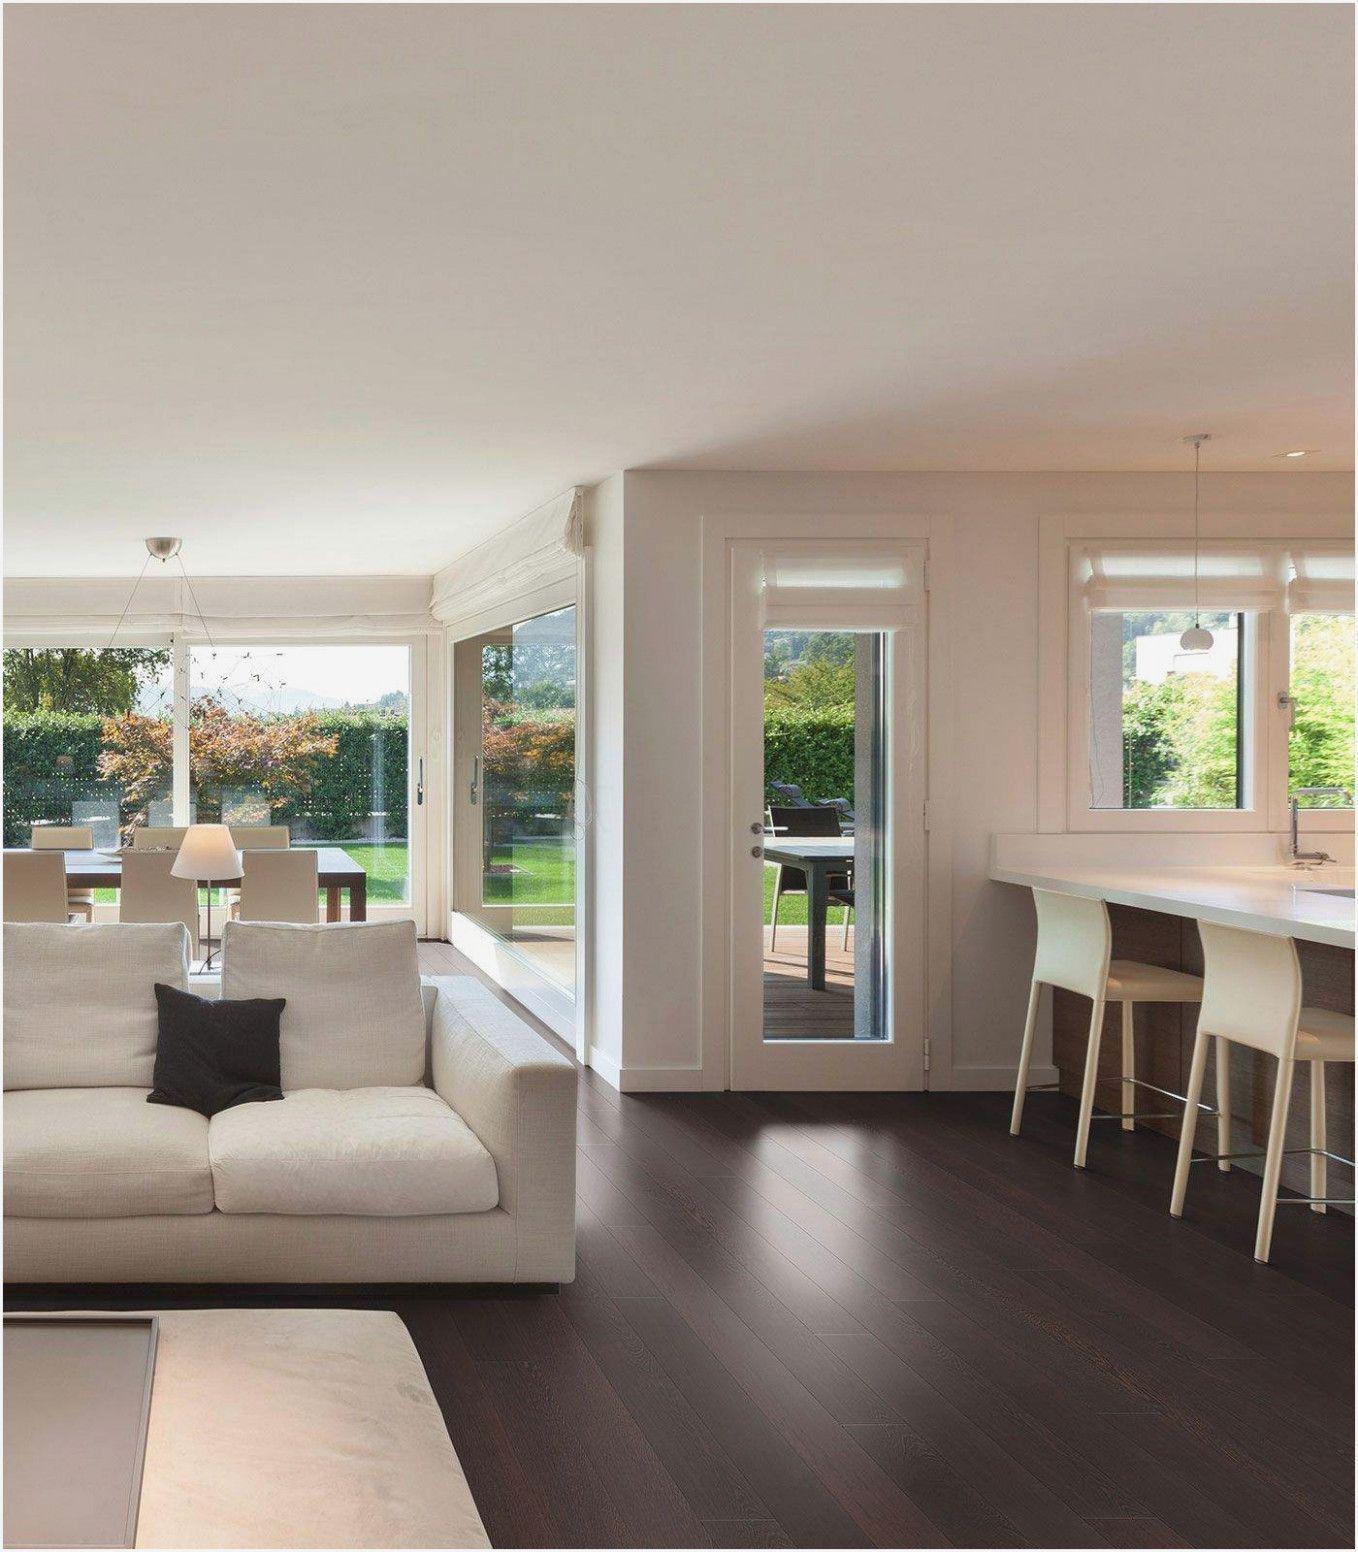 6 Wohnzimmer Ideen Boden - #Boden #bodenwohnzimmer #Ideen